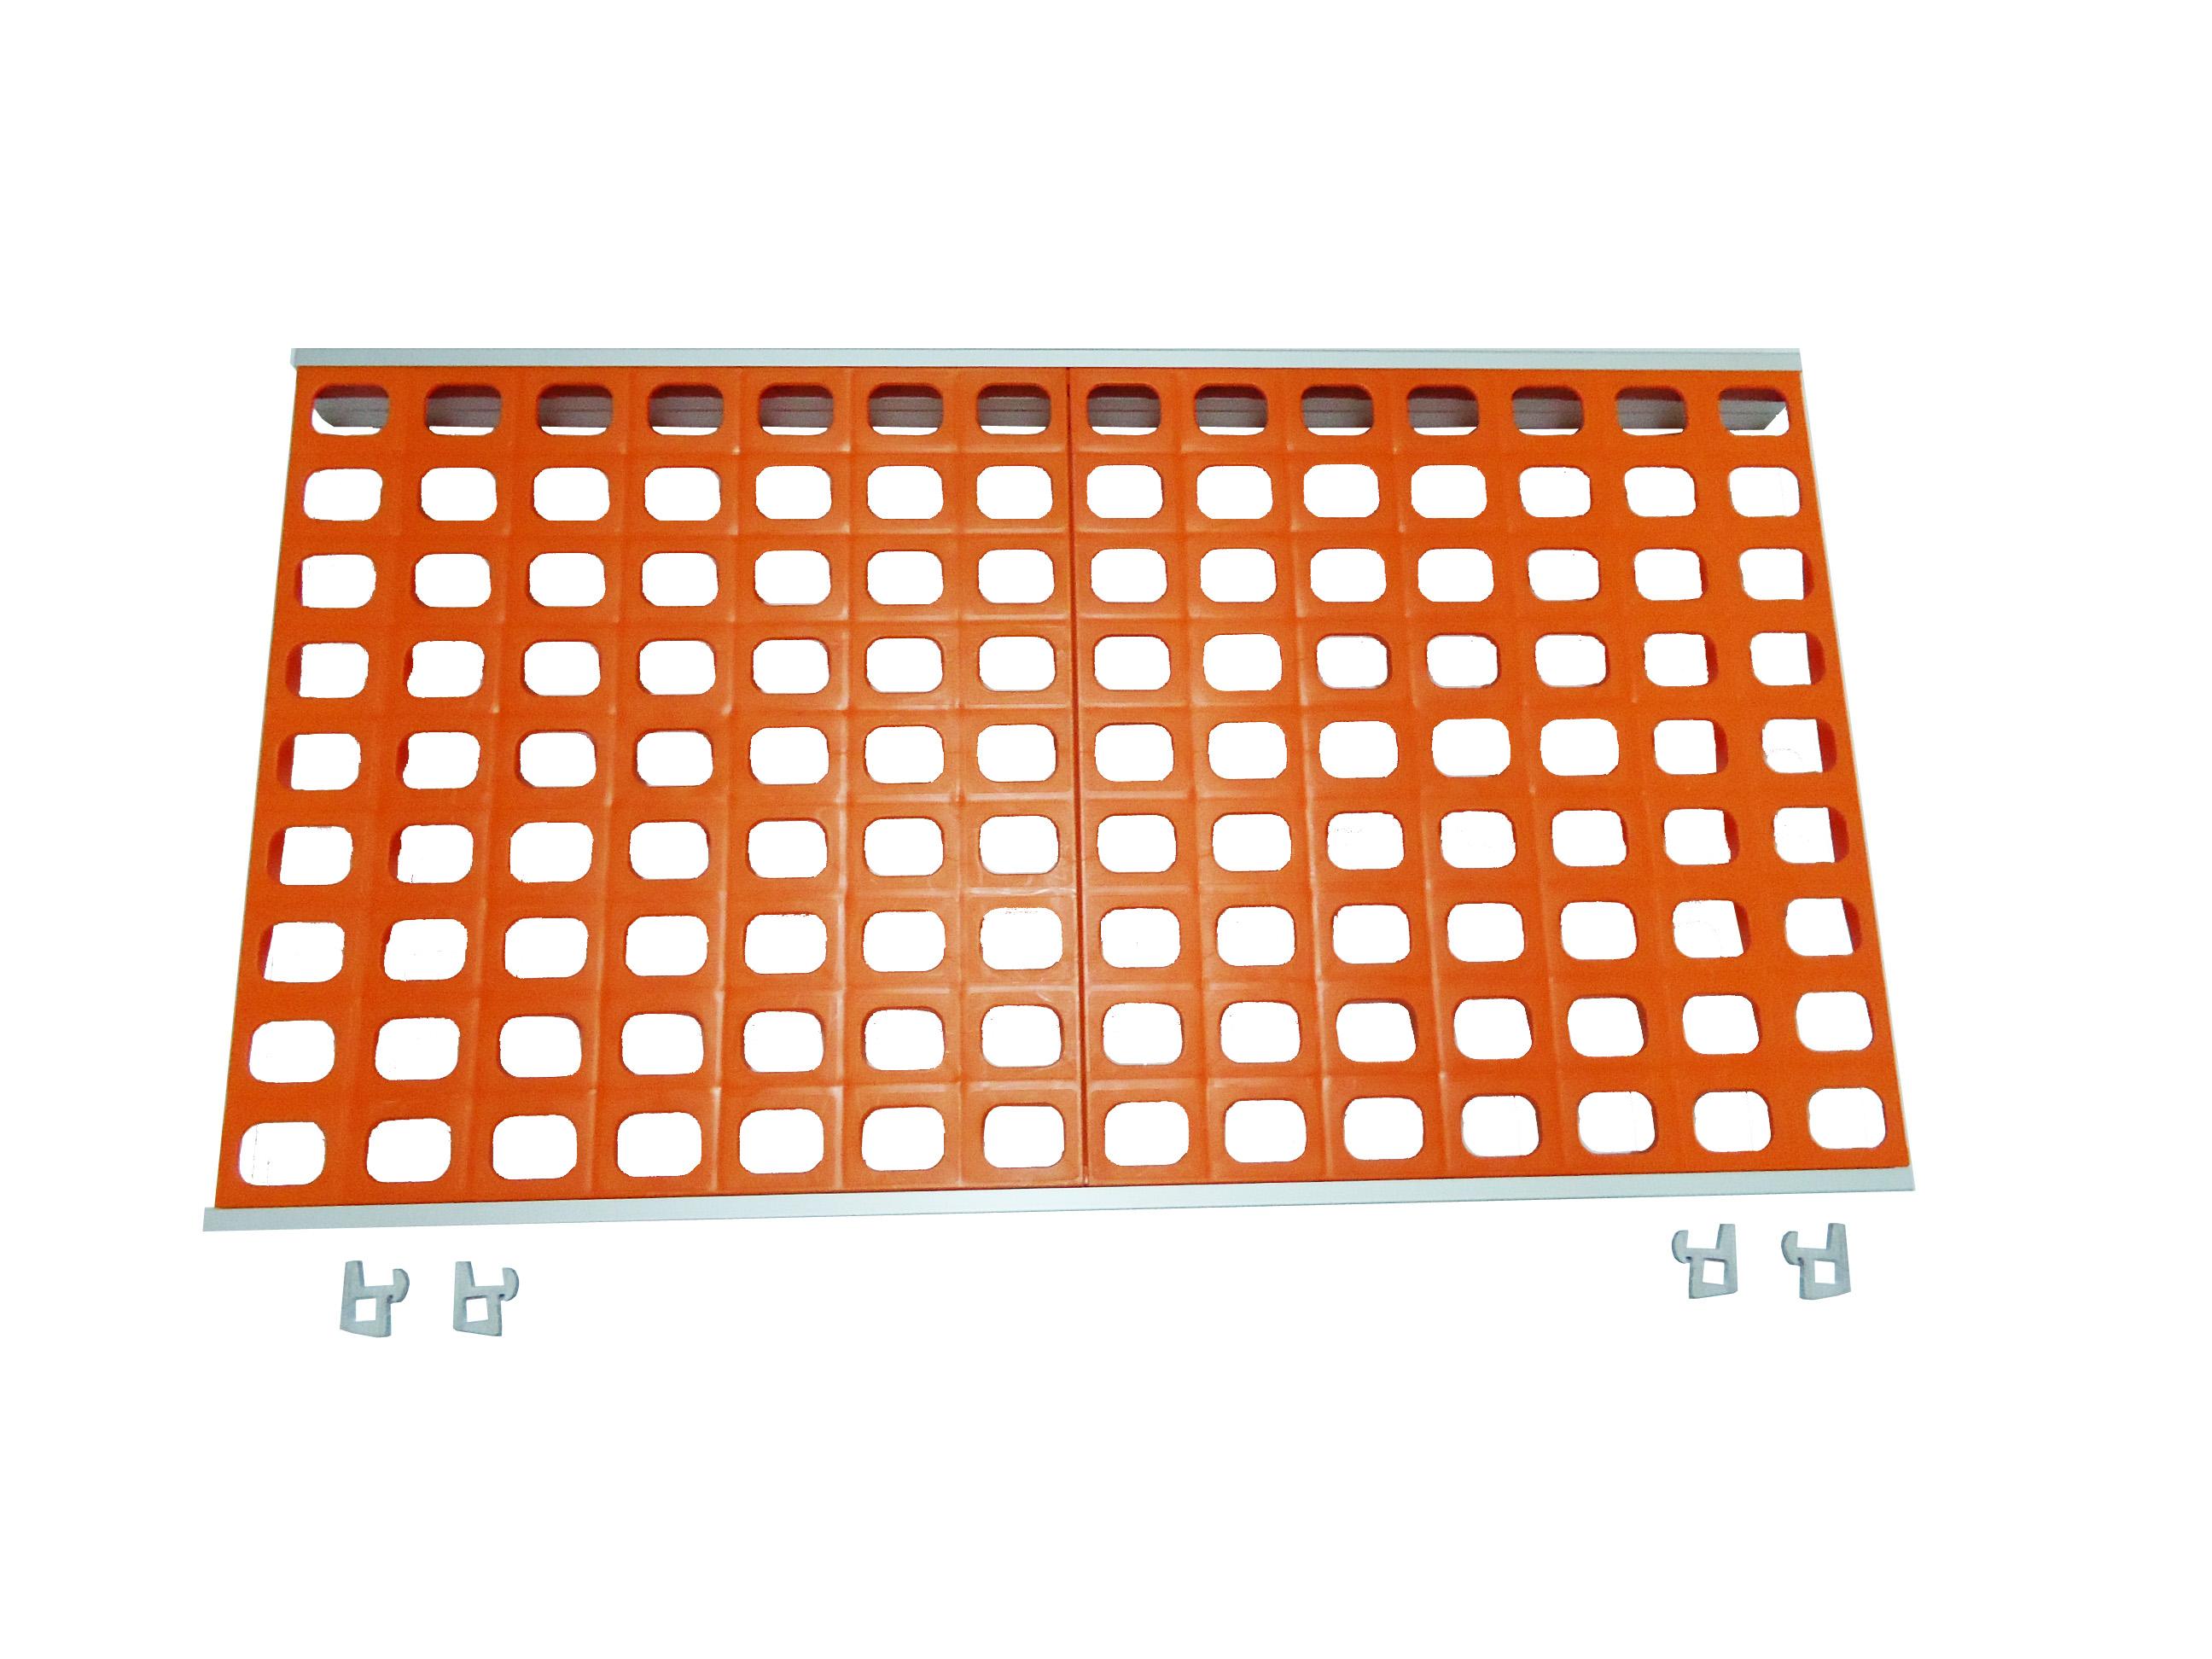 Coolblok KOPA4789C Ραφιέρα - Ράφι Ψυκτικών Θαλάμων Μονό Πολυαιθυλενίου - 890x470 ψυκτικοί θάλαμοι    ράφια ψυκτικών θαλάμων  ψυκτικοί θάλαμοι    ράφια ψυκτικών θ